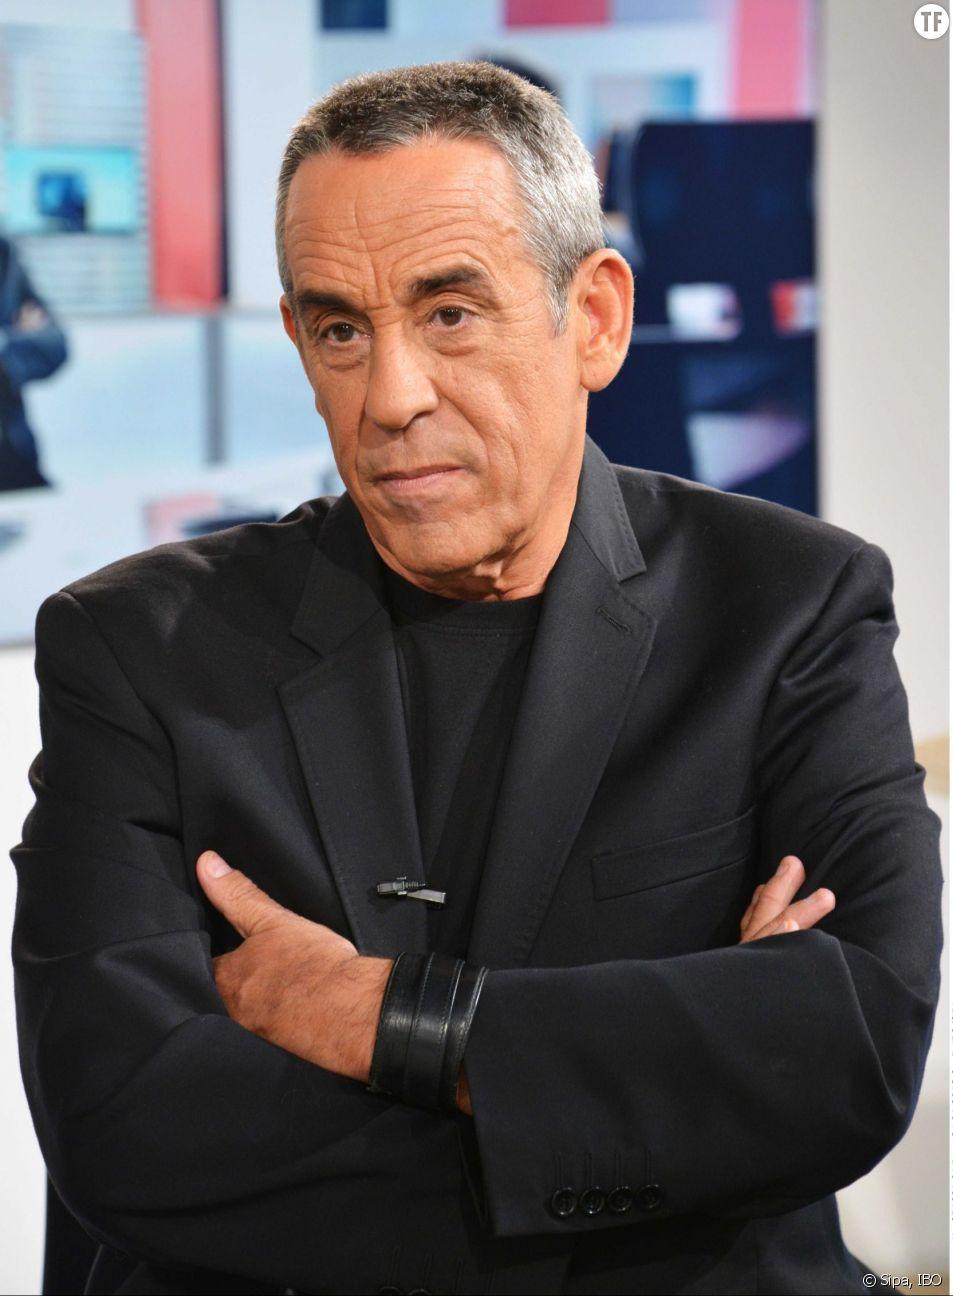 Slt Thierry Ardisson Insulte Joey Starr Qui Lui Repond Violemment Video Terrafemina